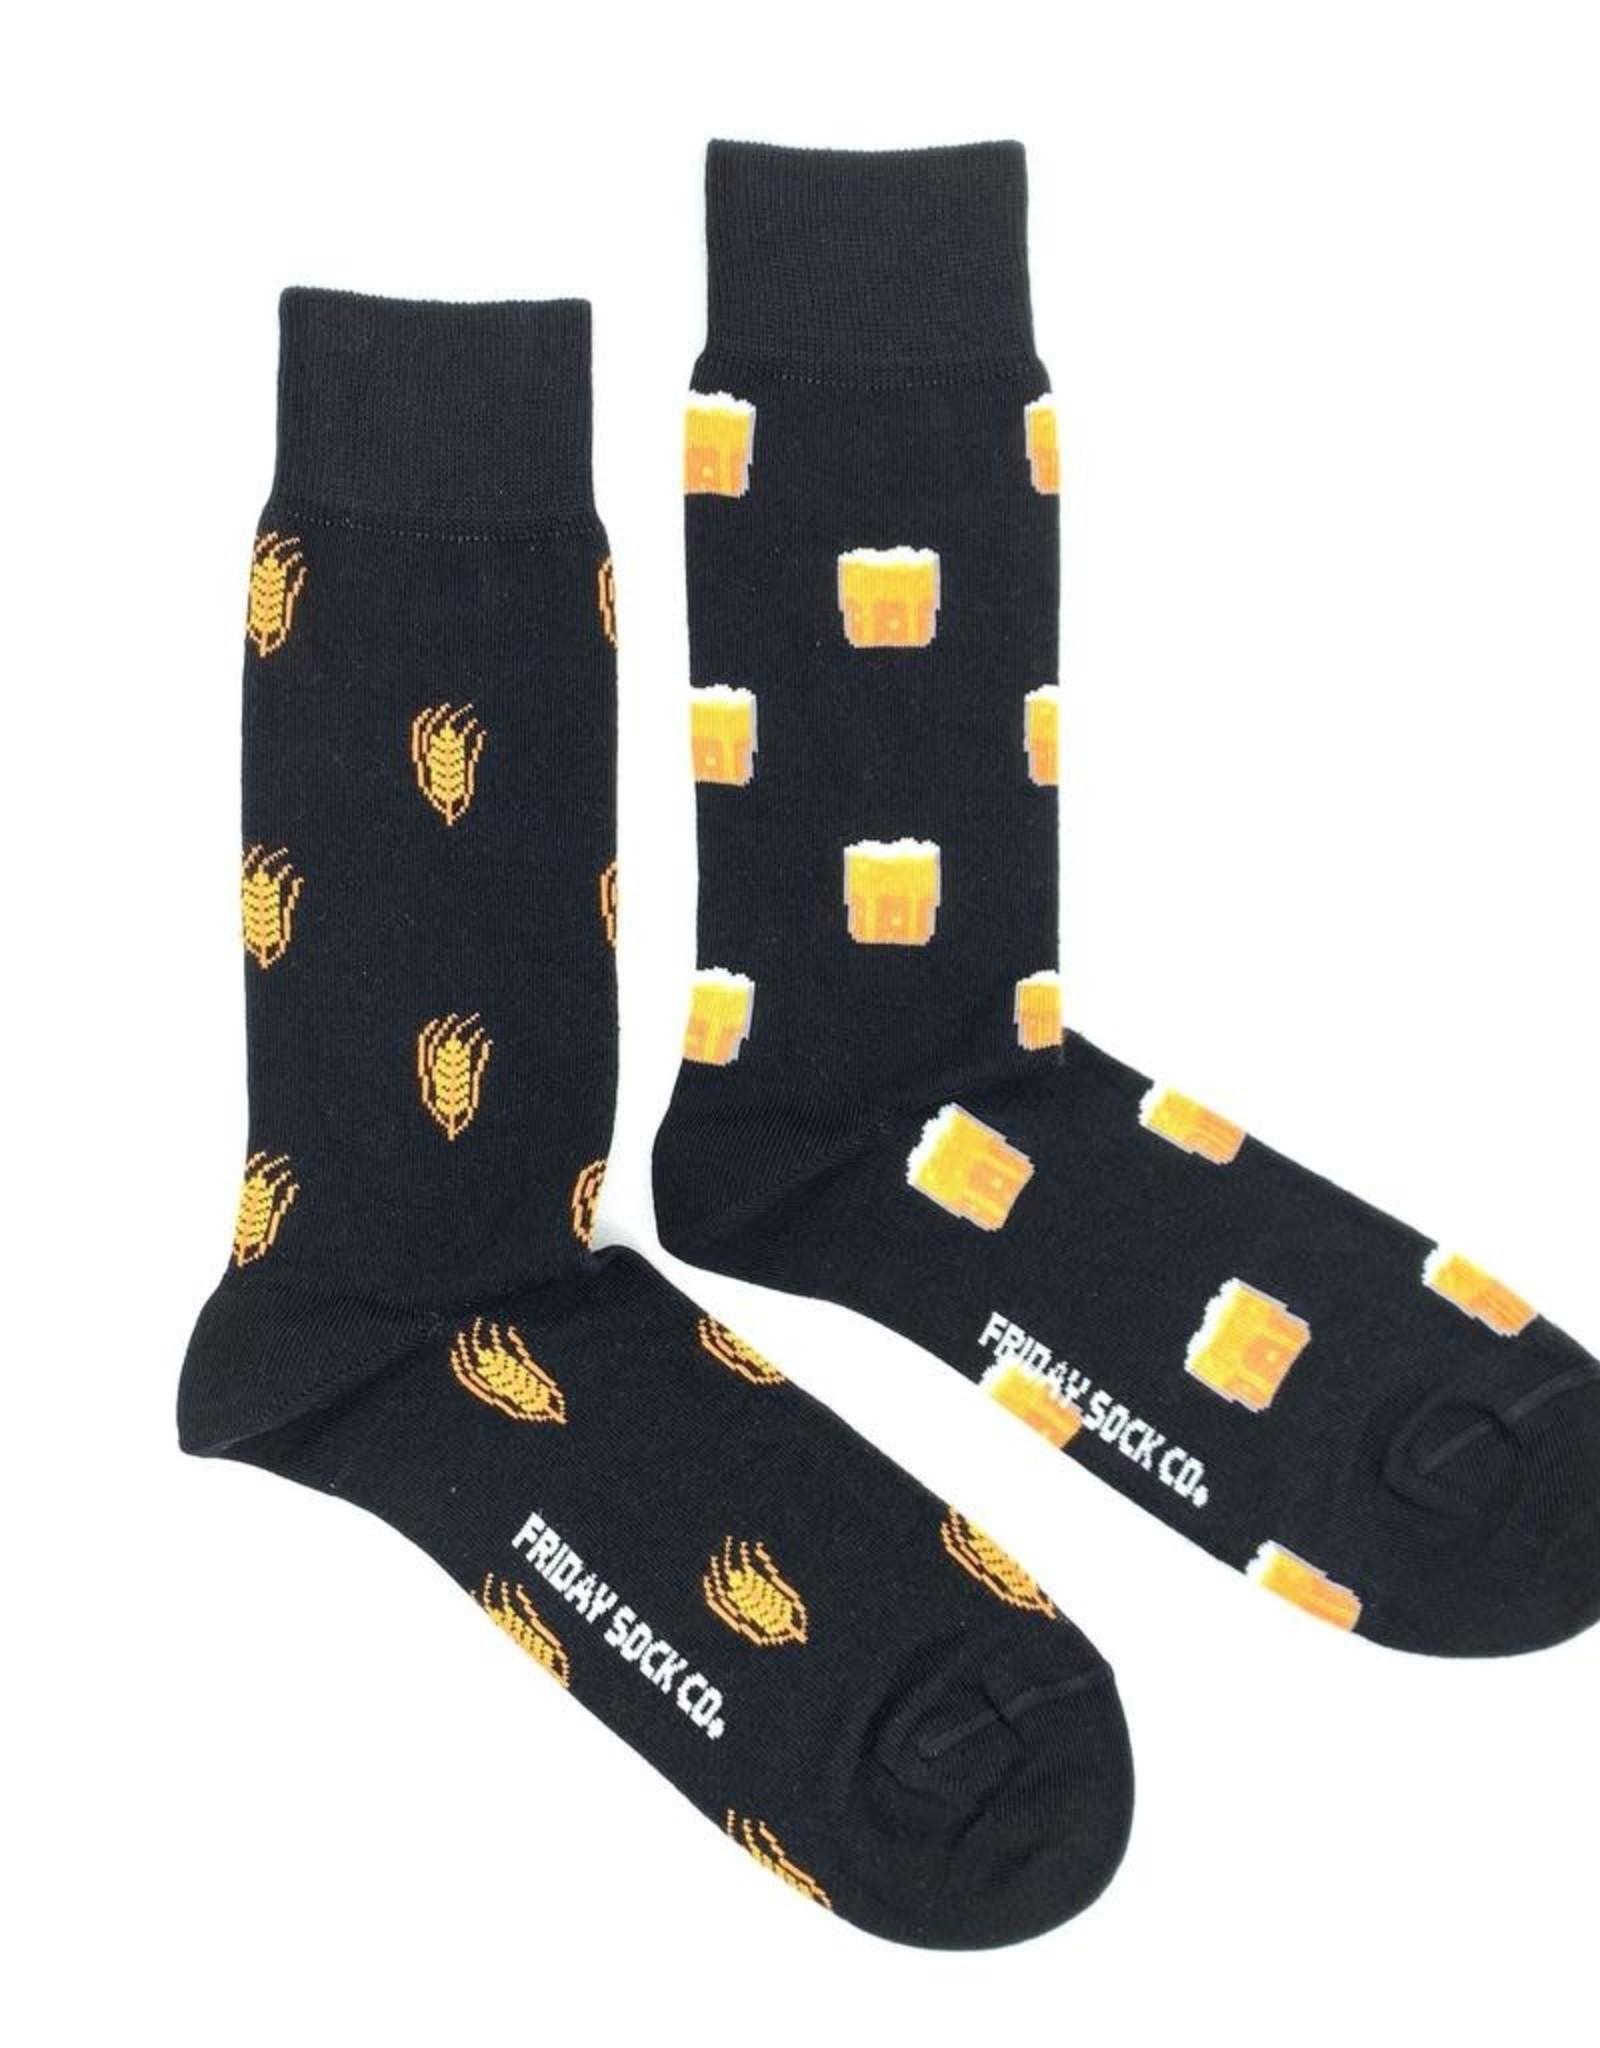 Friday Sock Co Friday Sock Co Beer And Barley Socks